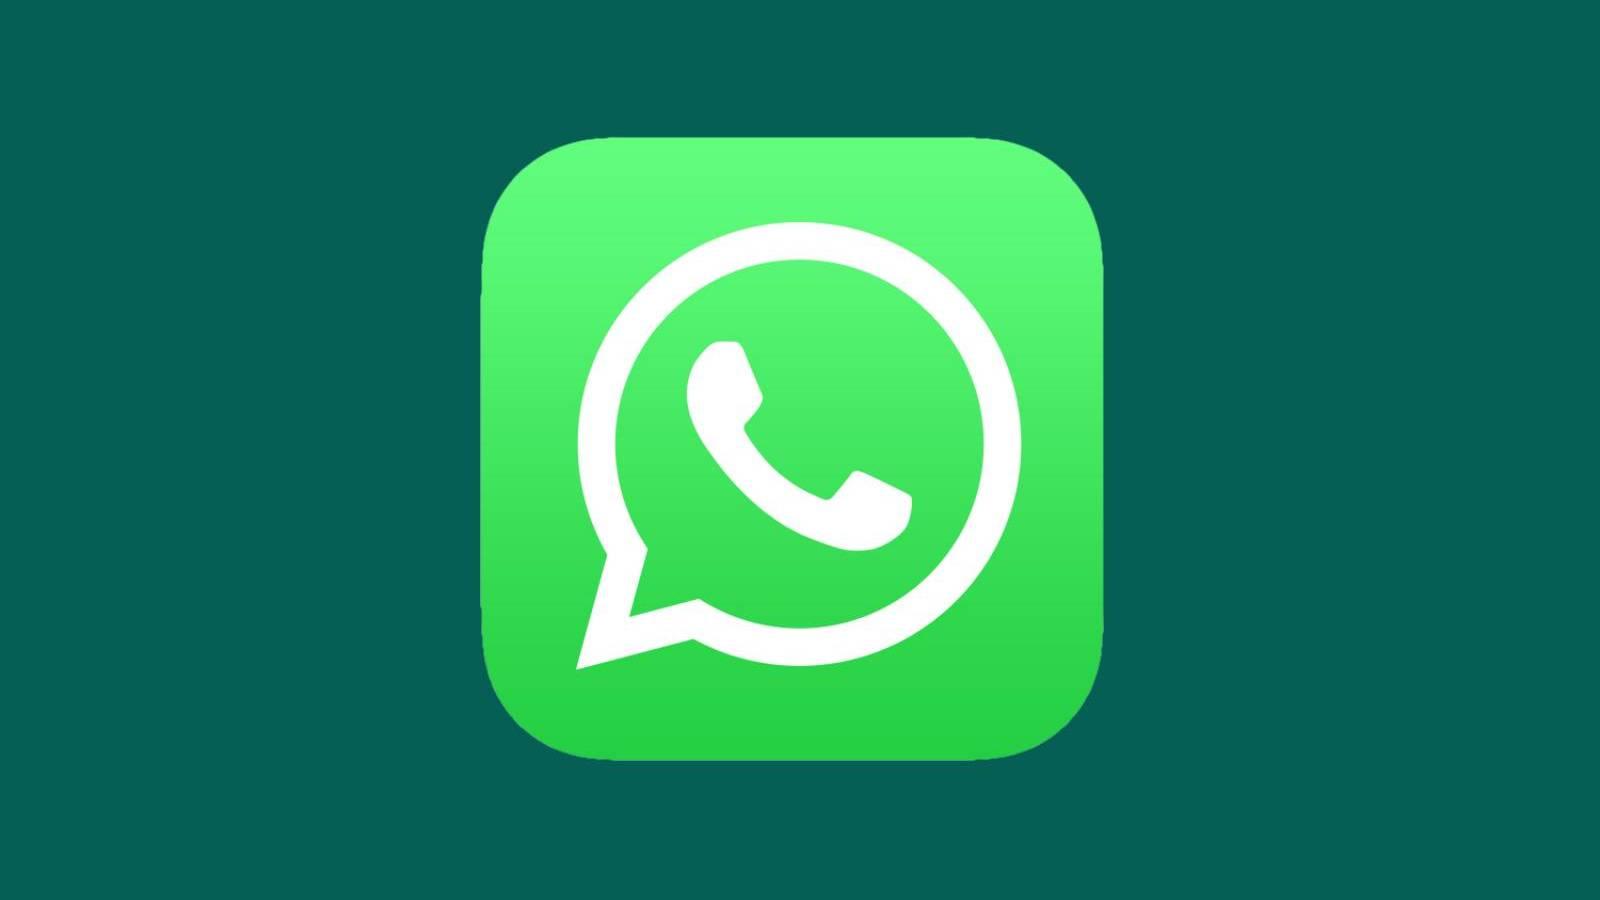 WhatsApp greseala